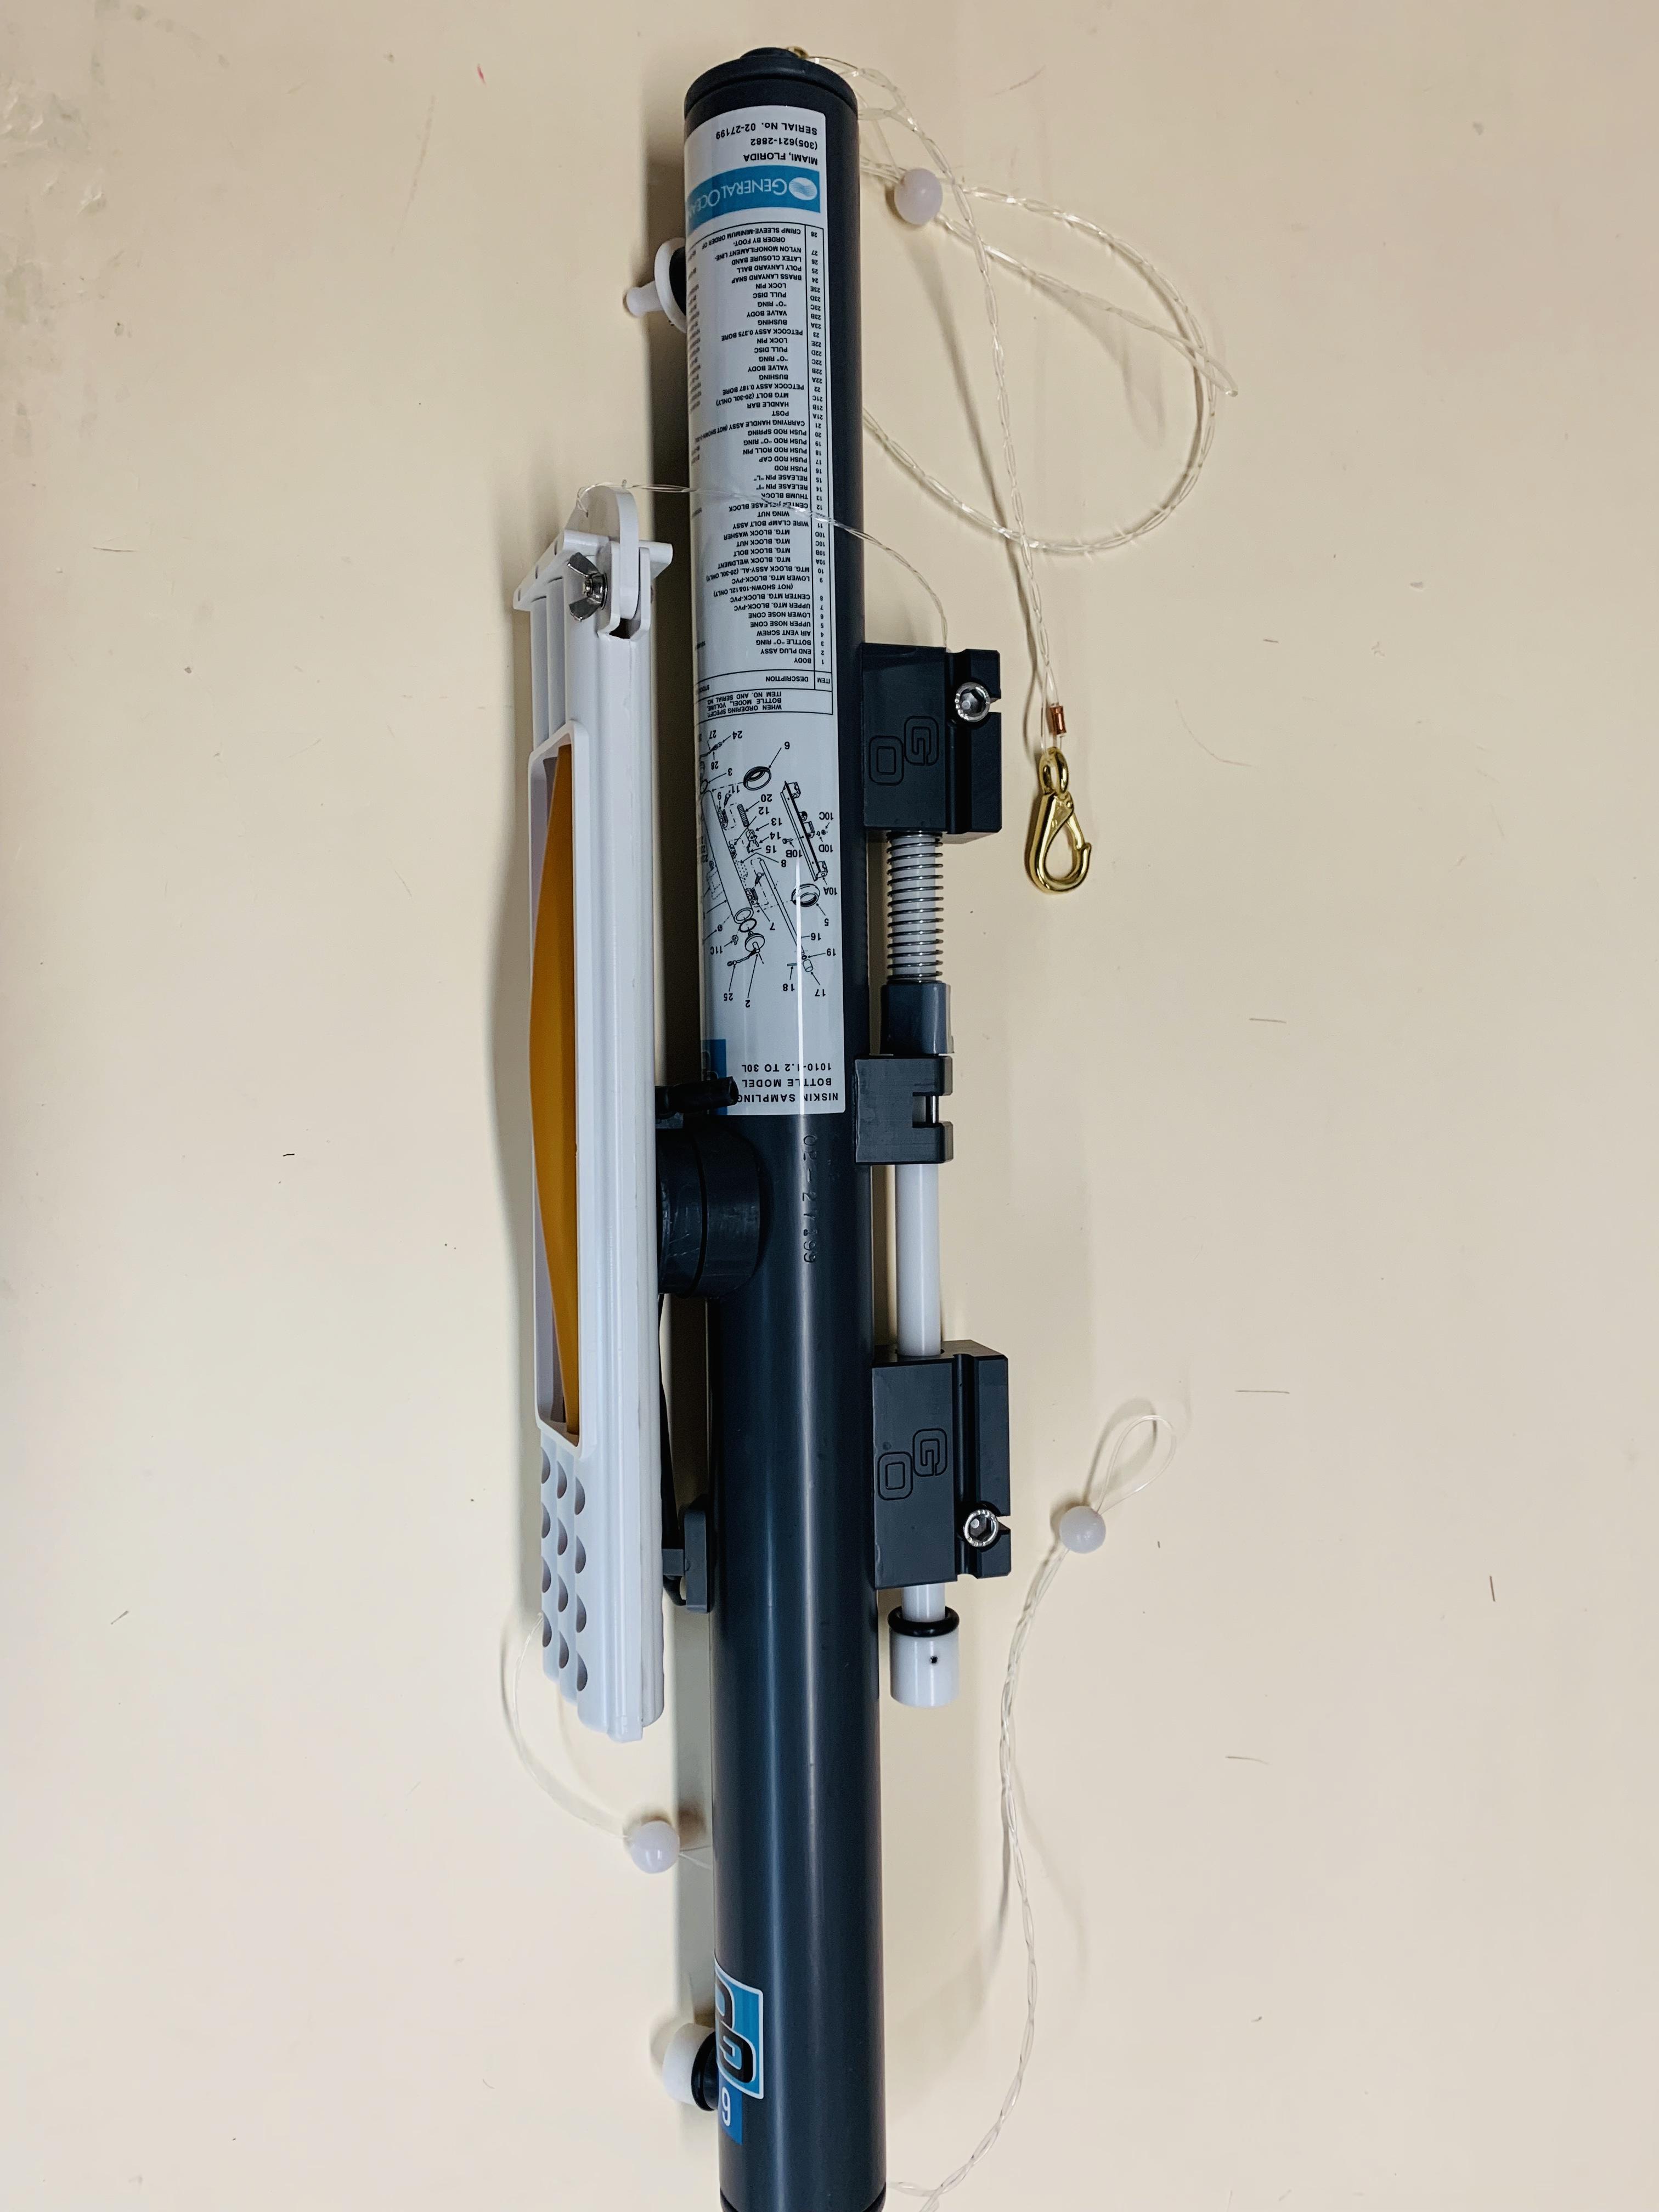 3-Thermometer Rev.Assembly1.2L Bottle